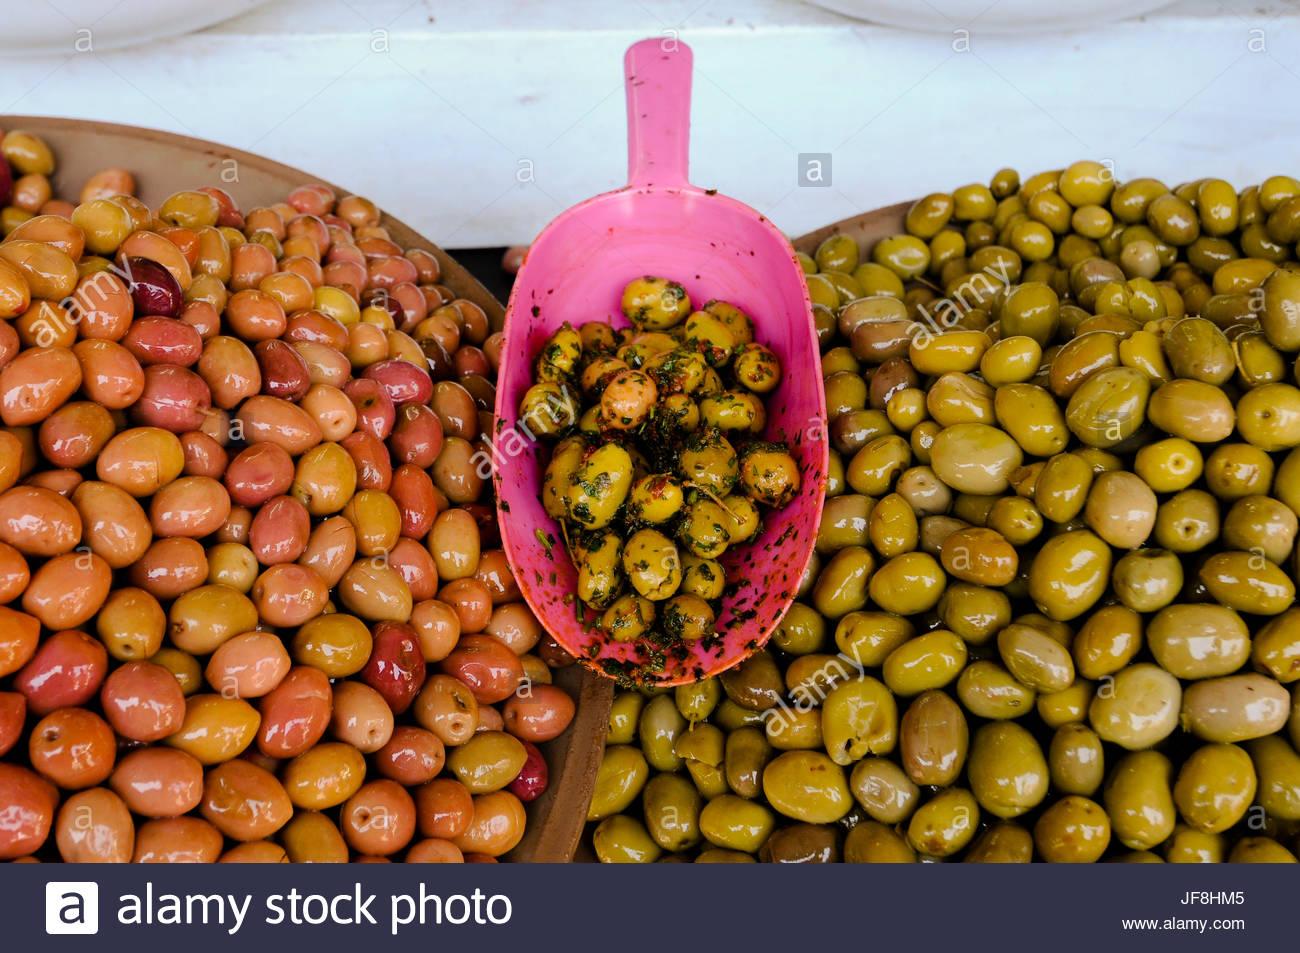 Schalen der ausgehärteten Oliven zum Verkauf an den Souk Medina. Stockbild